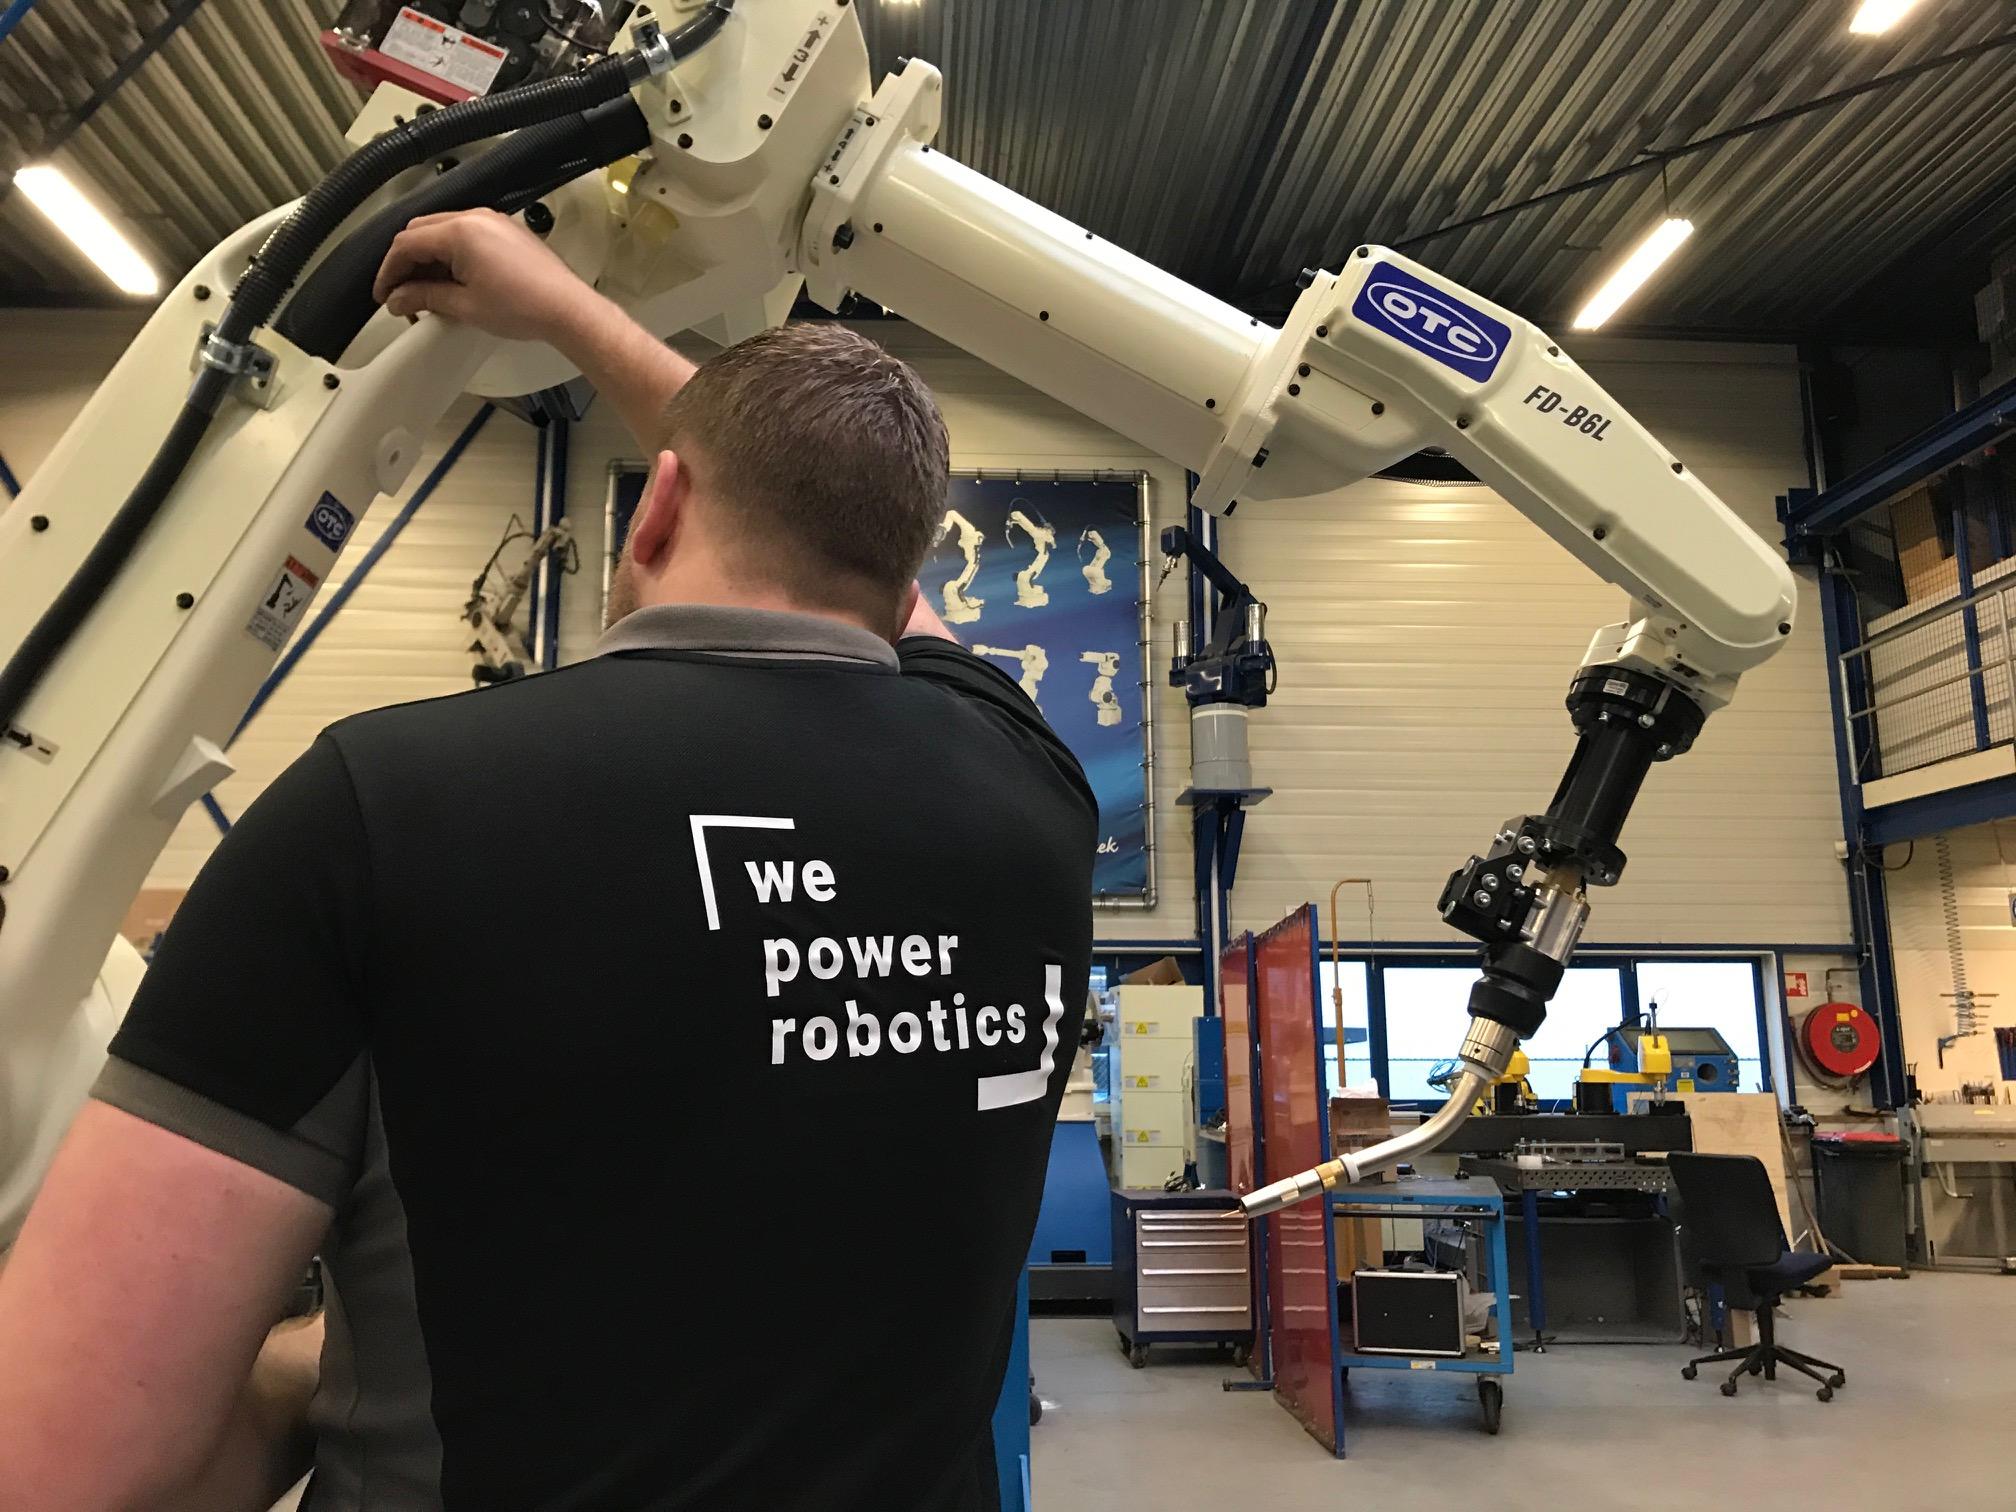 De service van Rolan robotics!